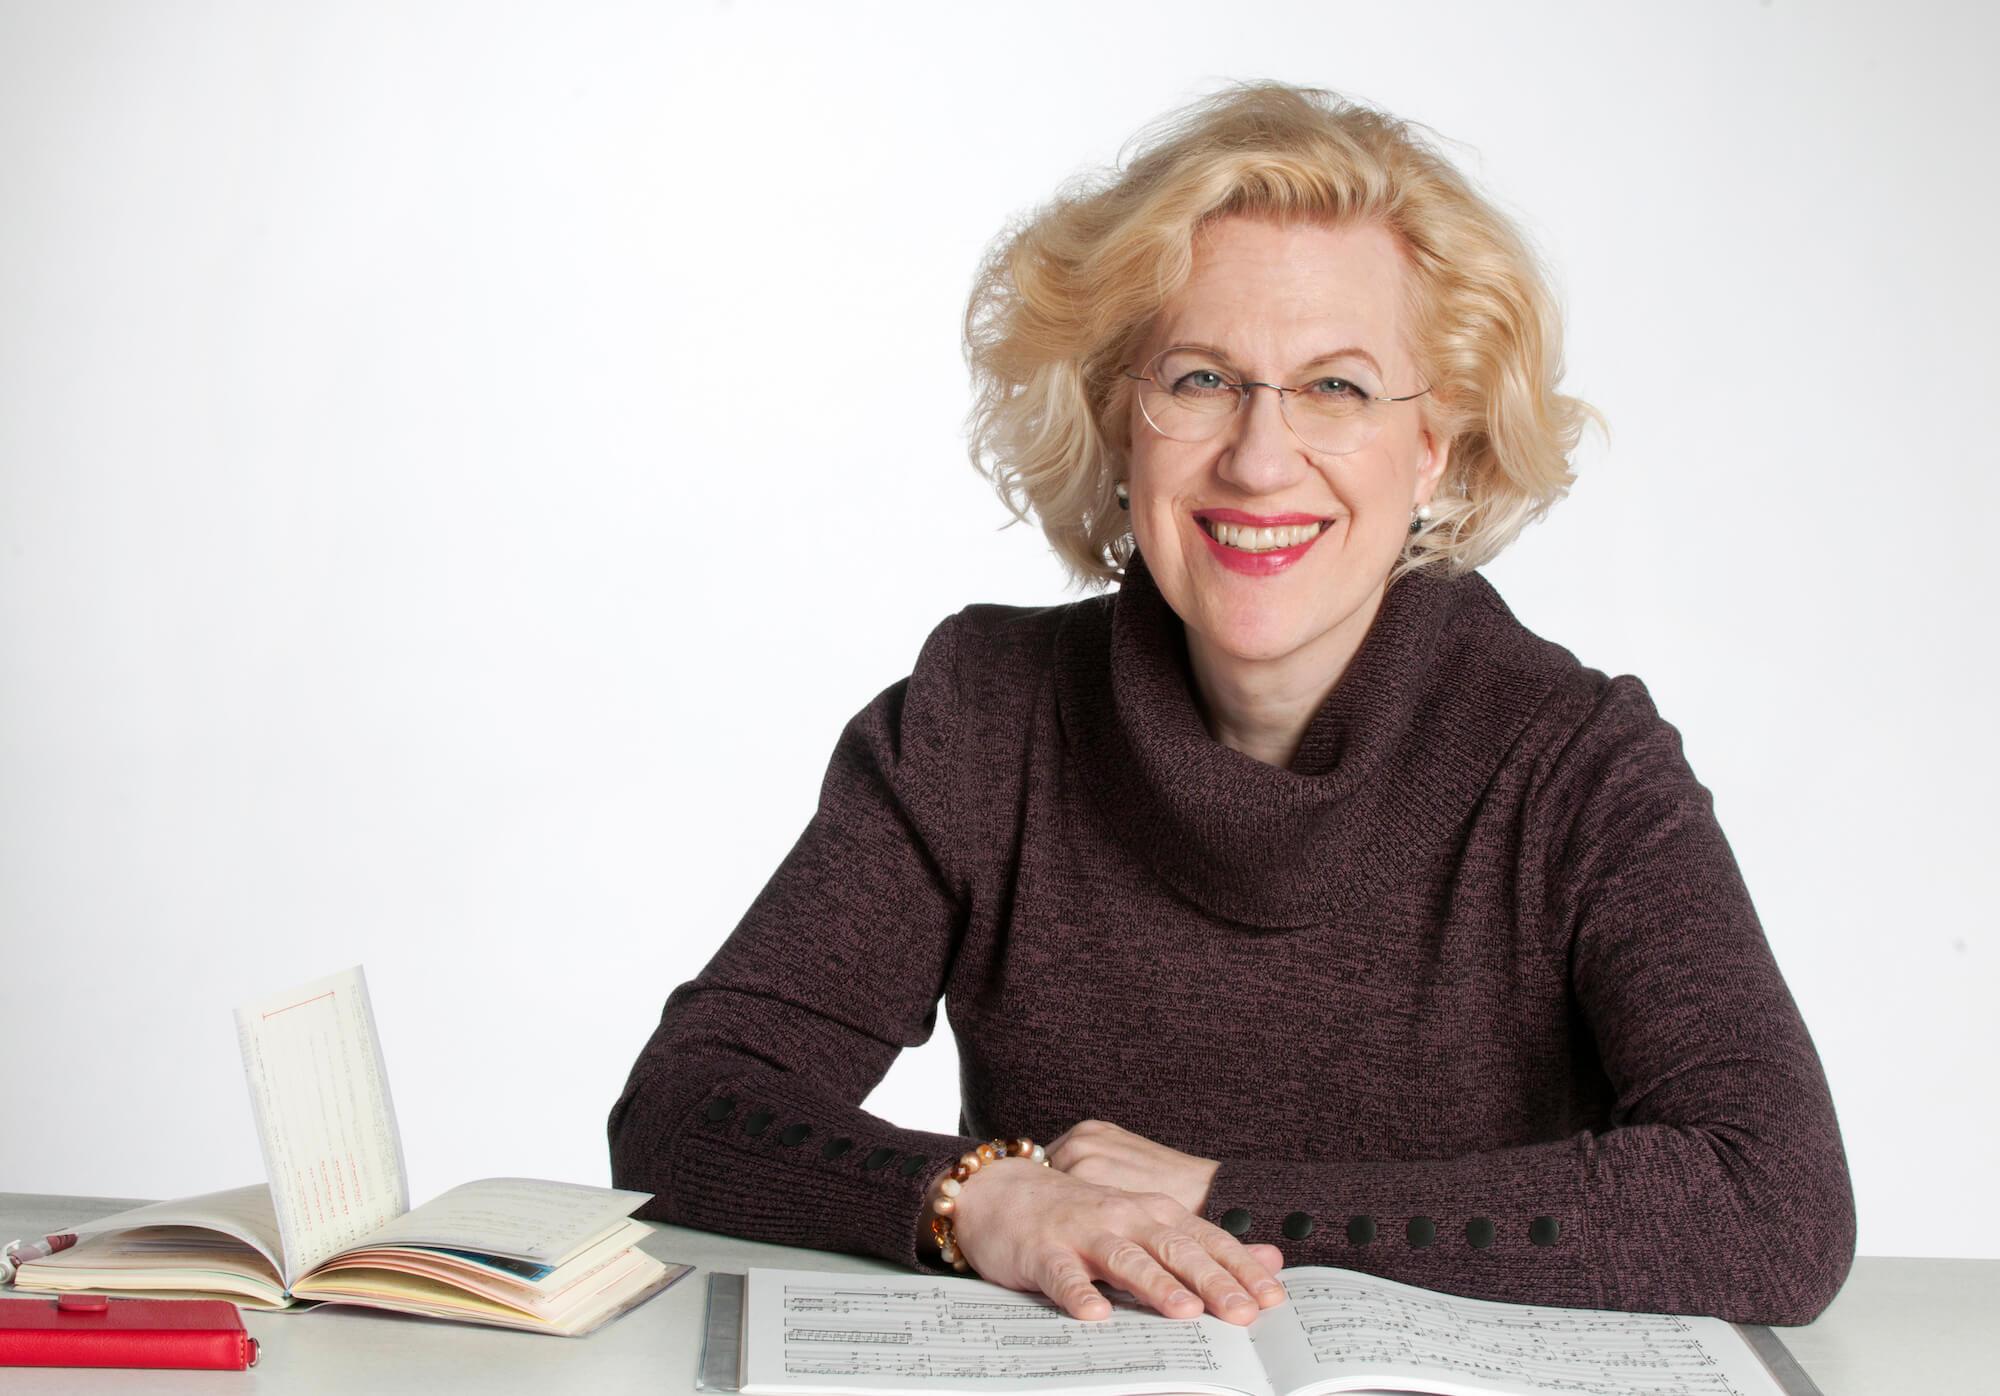 Sara Davis Buechner, world-renowned pianist